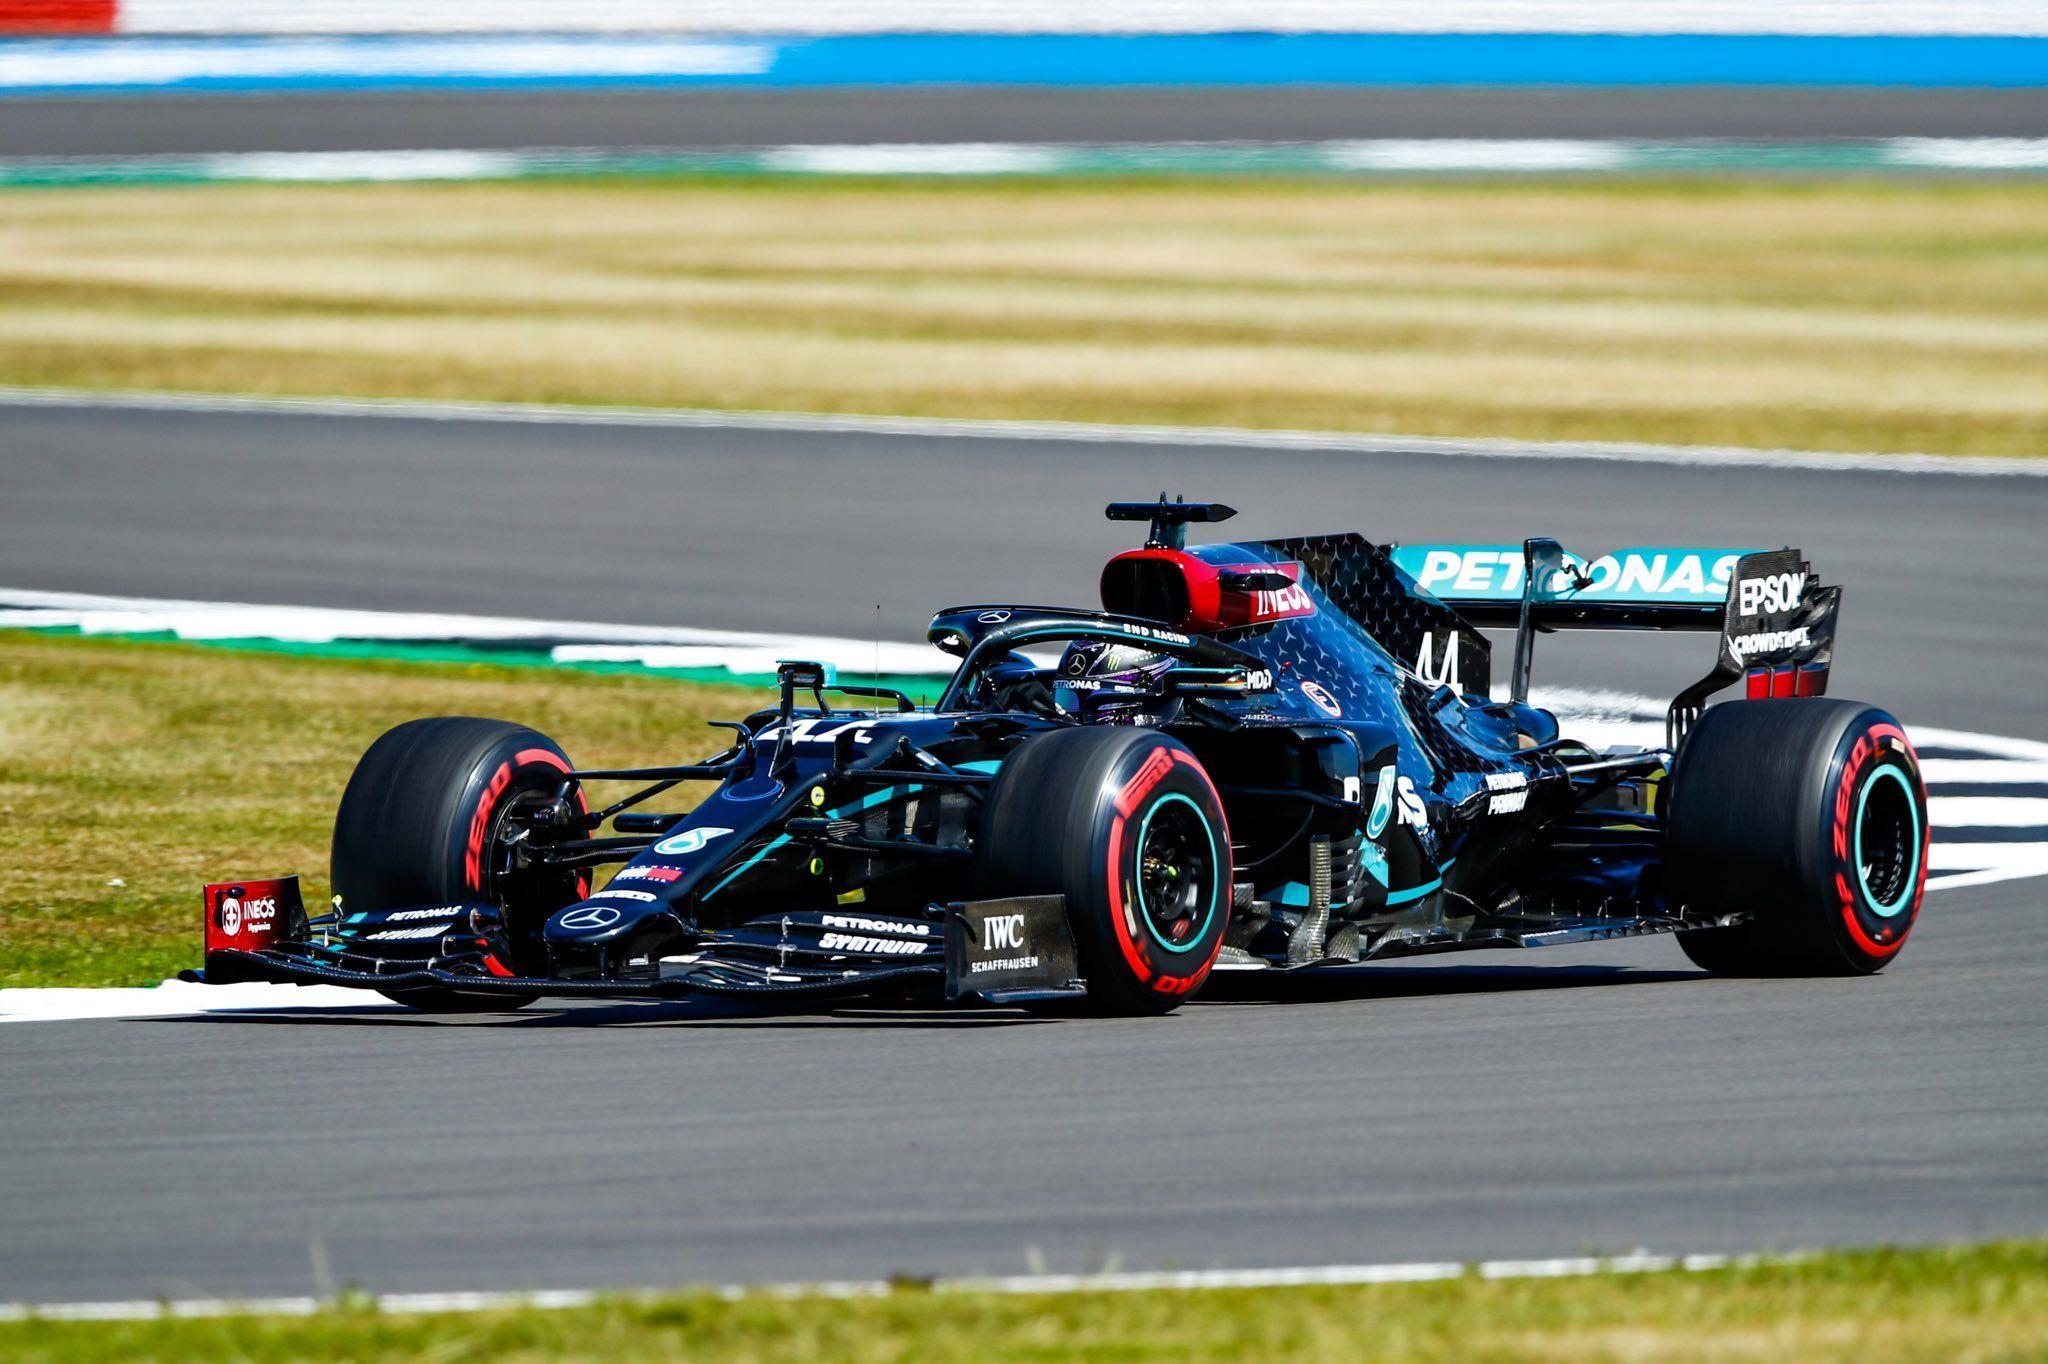 70th Anniversary GP, Lewis Hamilton